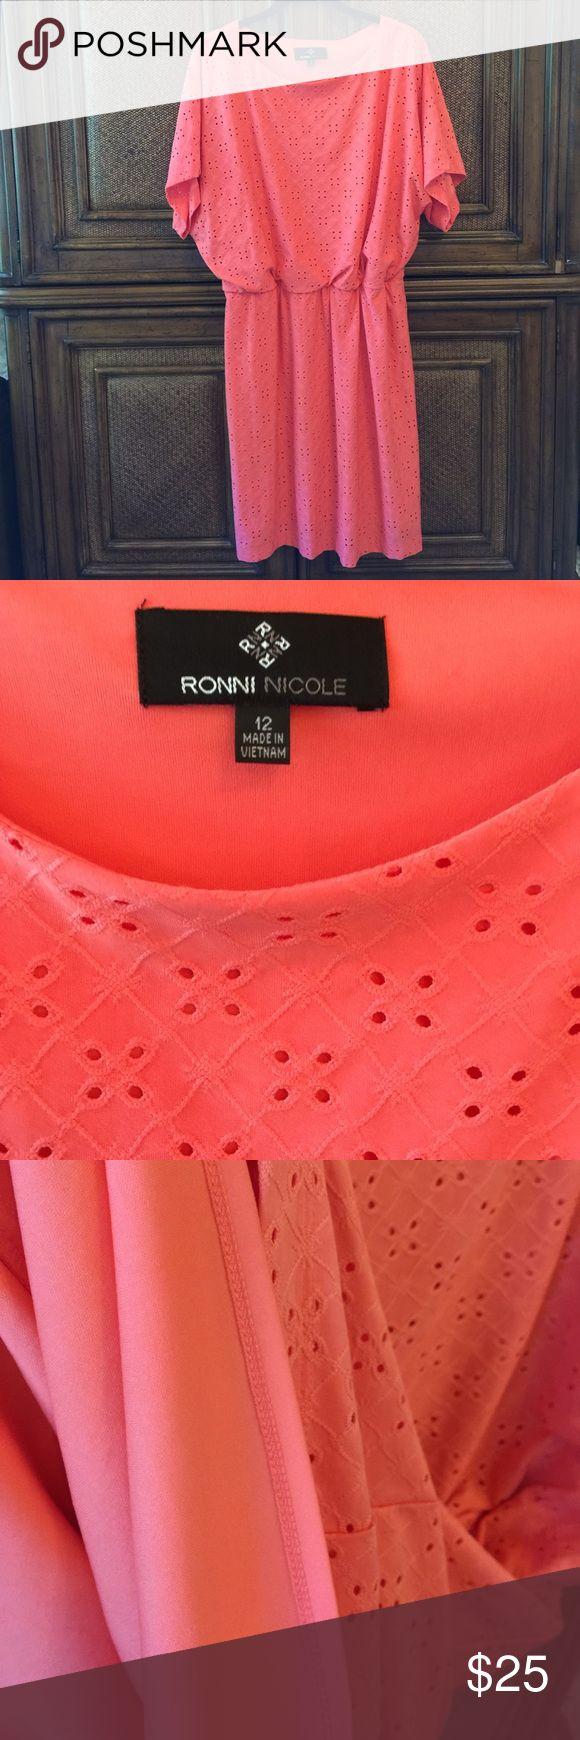 Peachy dress fully lined elastic waist stretchy Peachy dress fully lined elastic waist stretchy material NWOT Ronni Nicole Dresses Midi